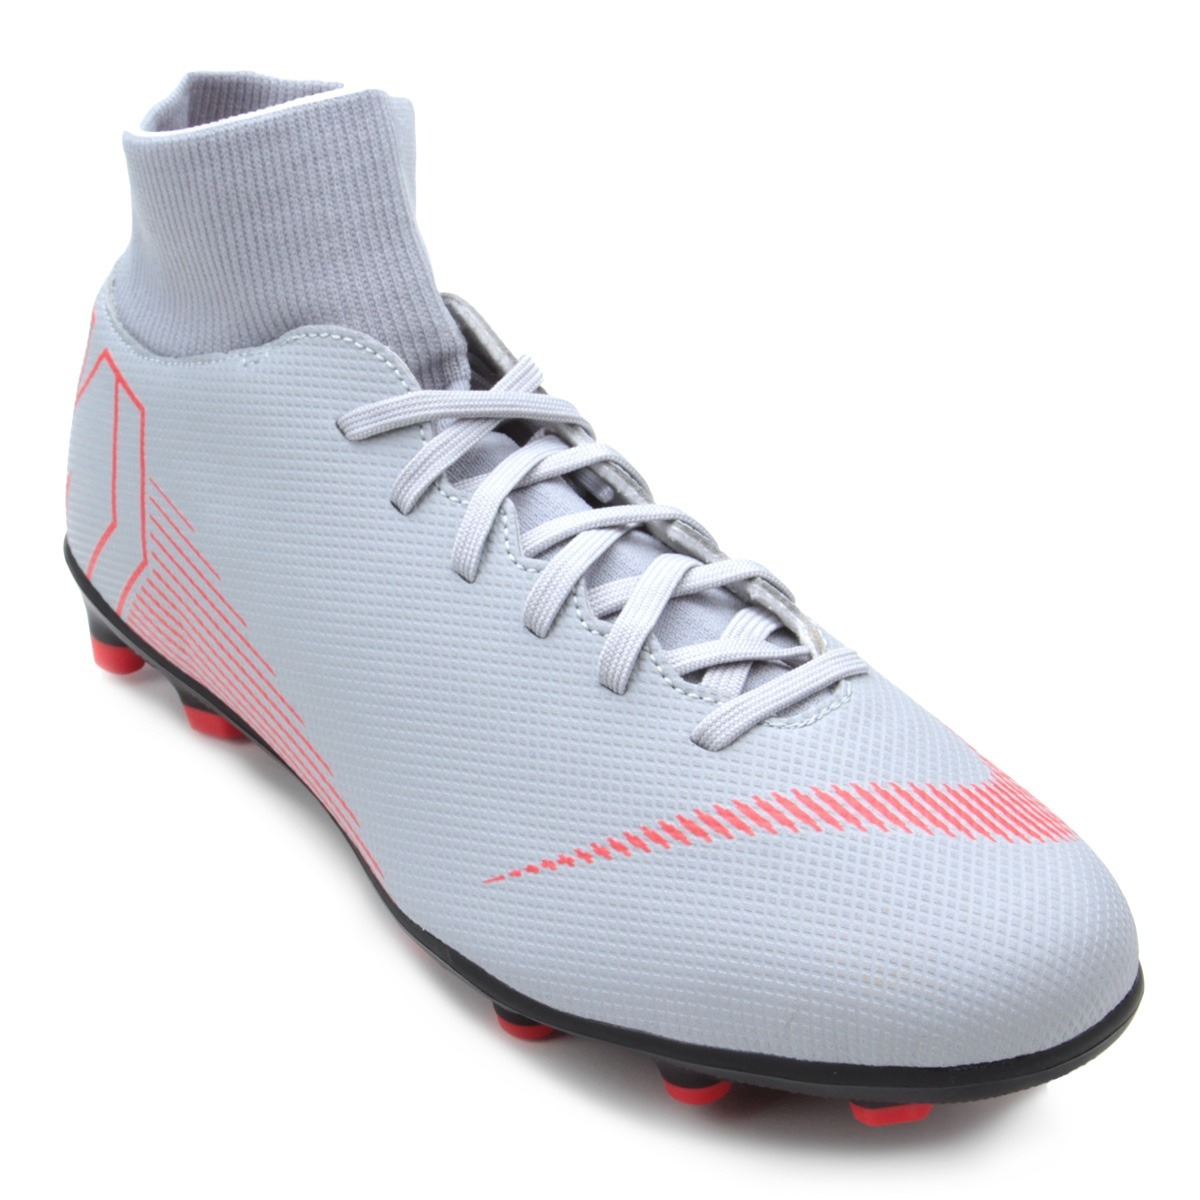 0f423a2eb7 Chuteira Nike Mercurial Superfly 6 C Original Botinha Oferta - R ...